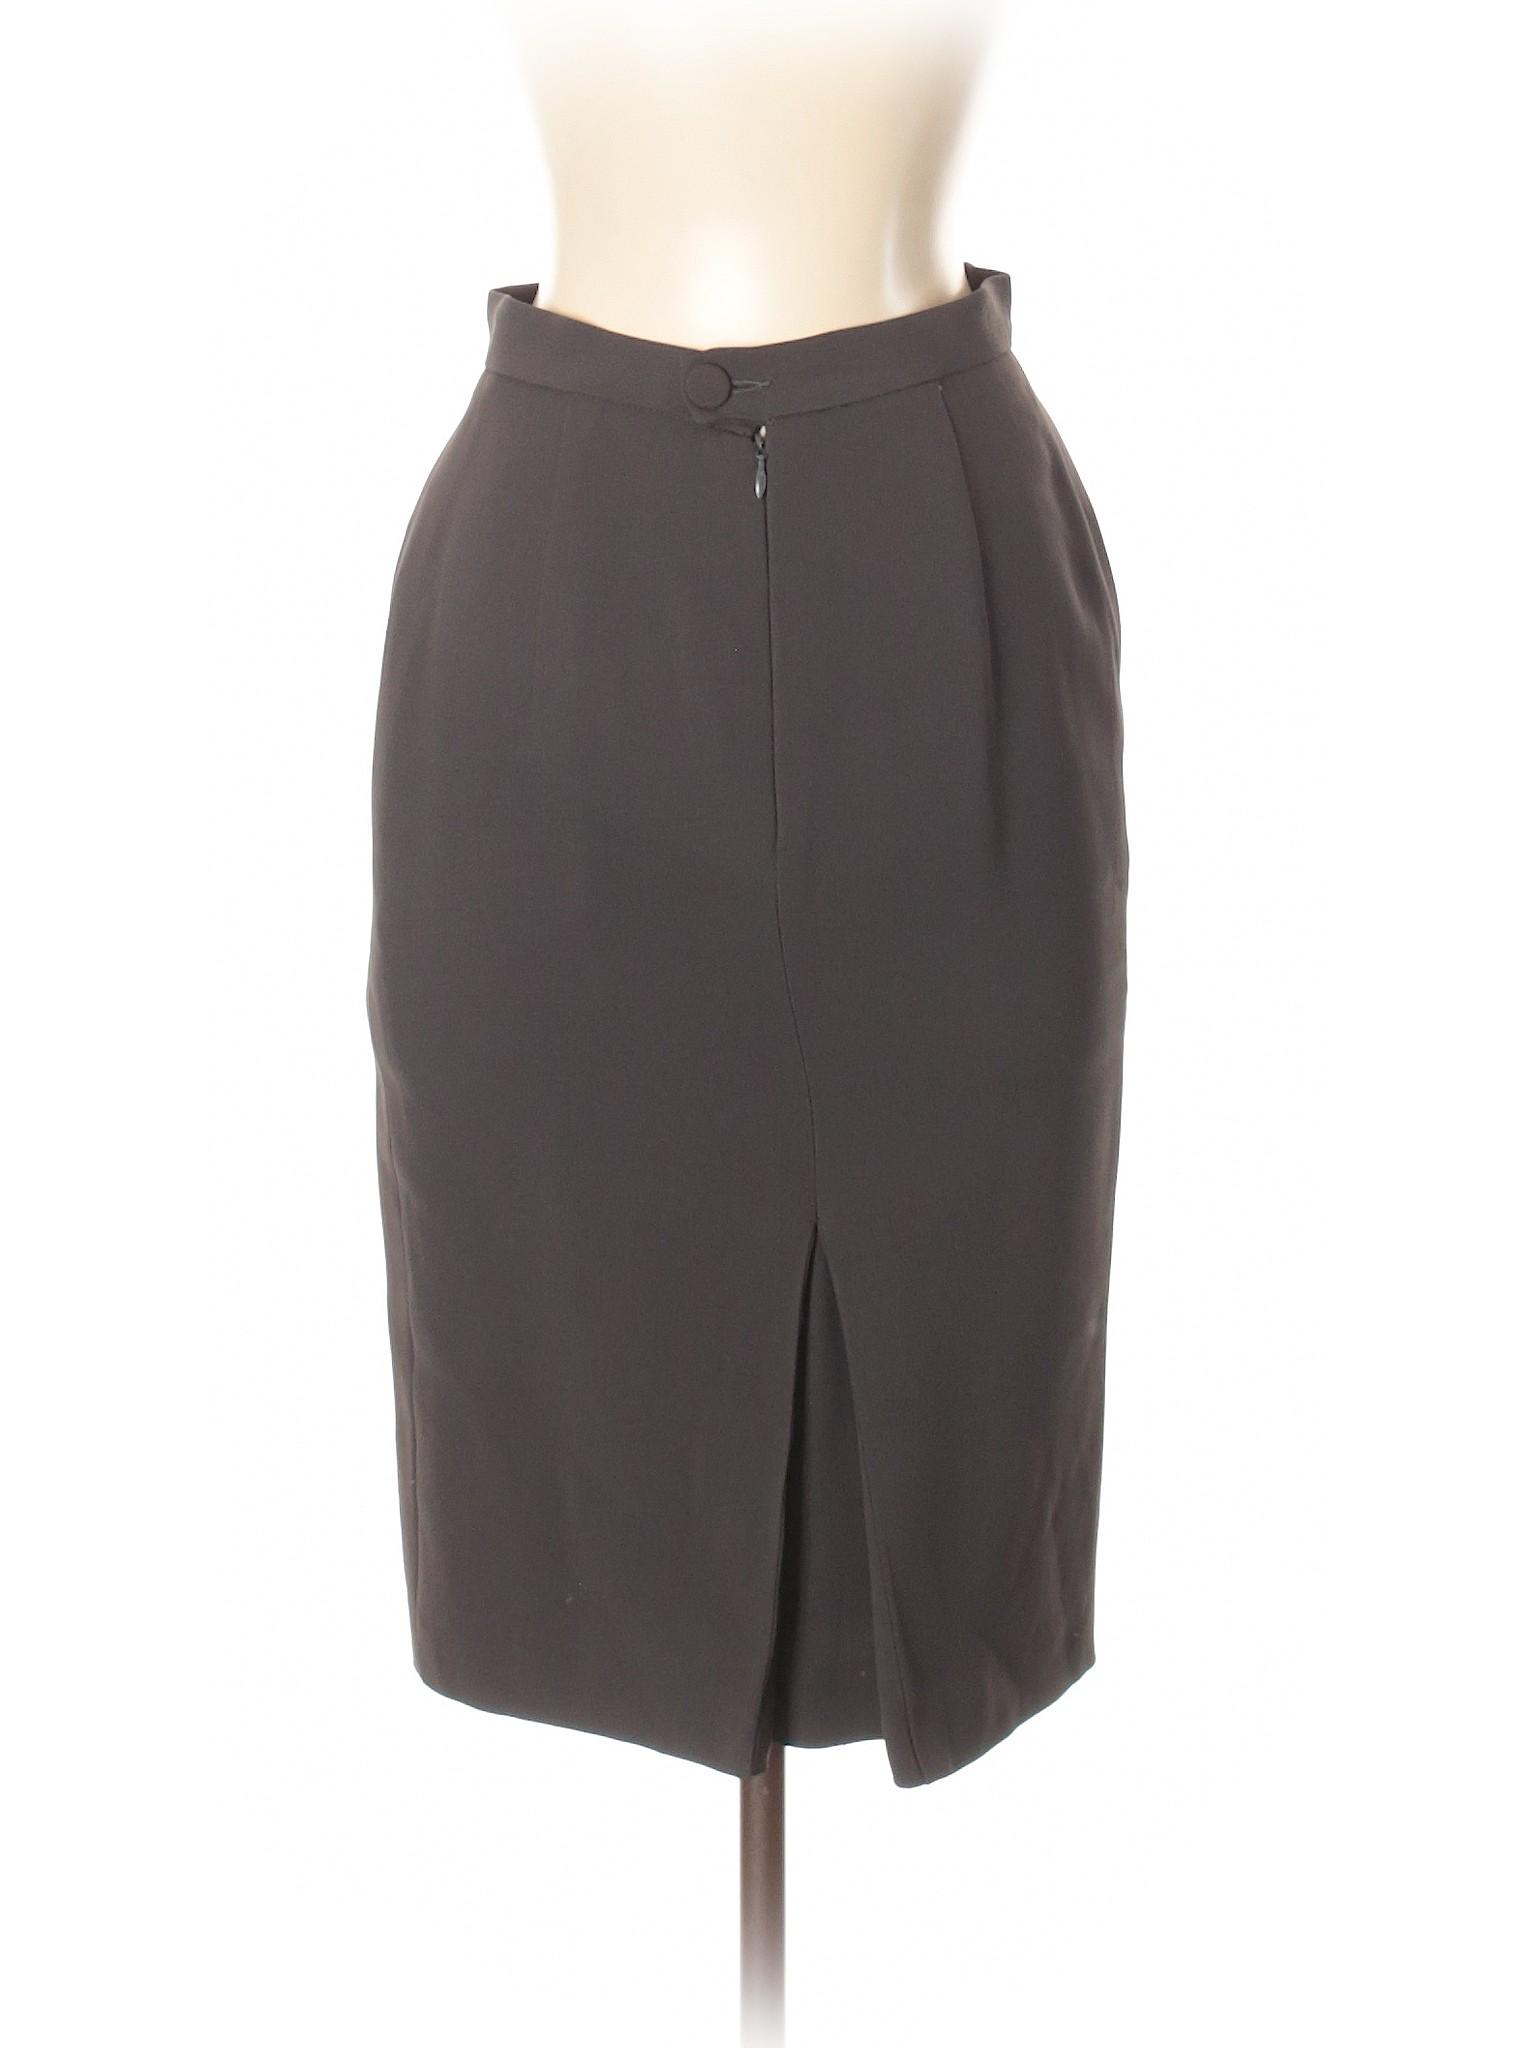 Boutique Casual Casual Casual Skirt Skirt Boutique Casual Boutique Skirt Boutique Skirt WFqxnUC6